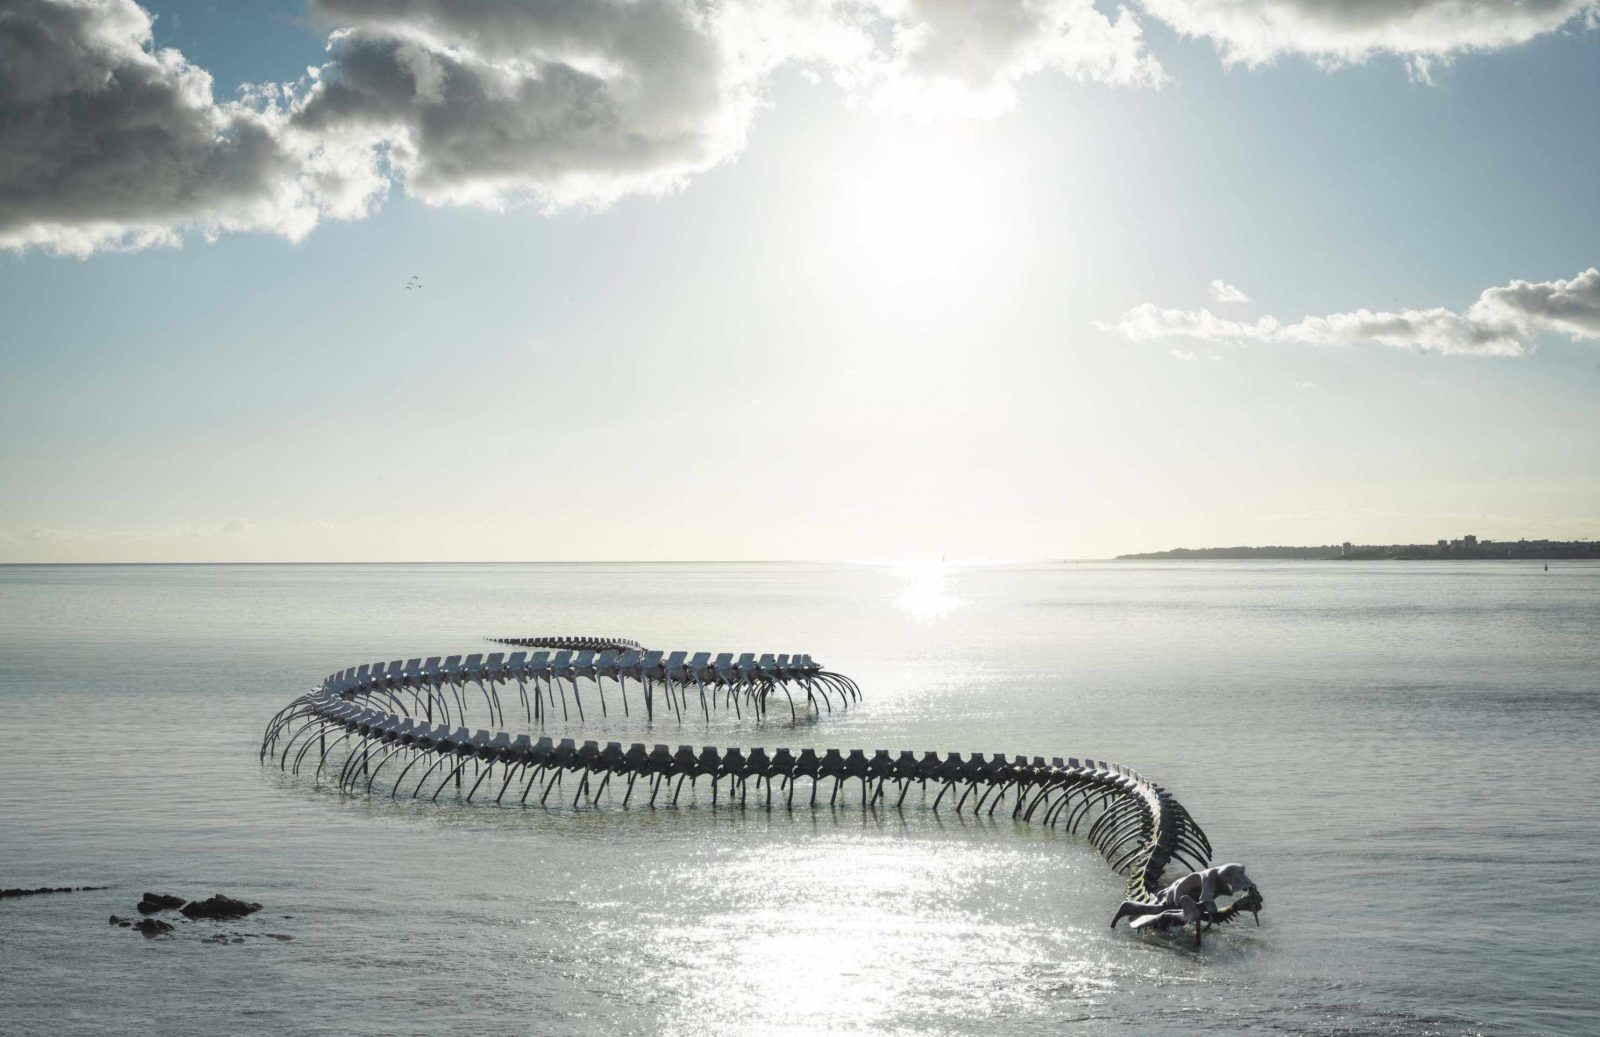 Huang Yong Ping, Serpent d'océan, Saint-Brévin-les-Pins © Franck Tomps